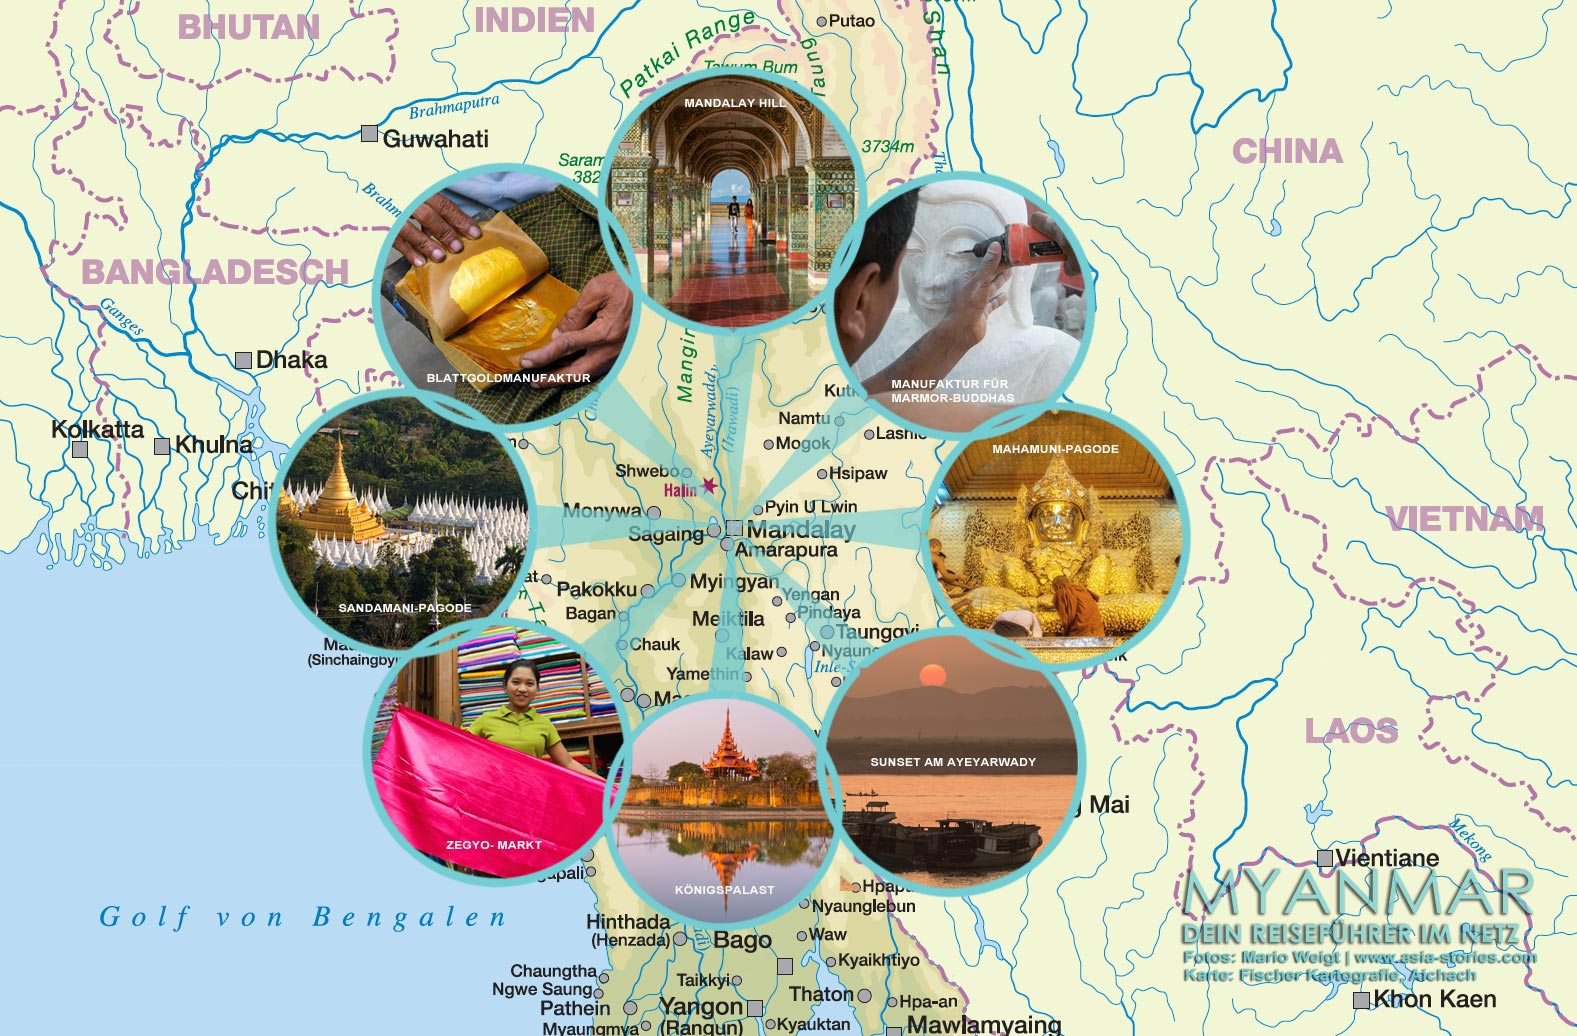 Karte Myanmar.Karte Von Mandalay Myanmar Reisetipps